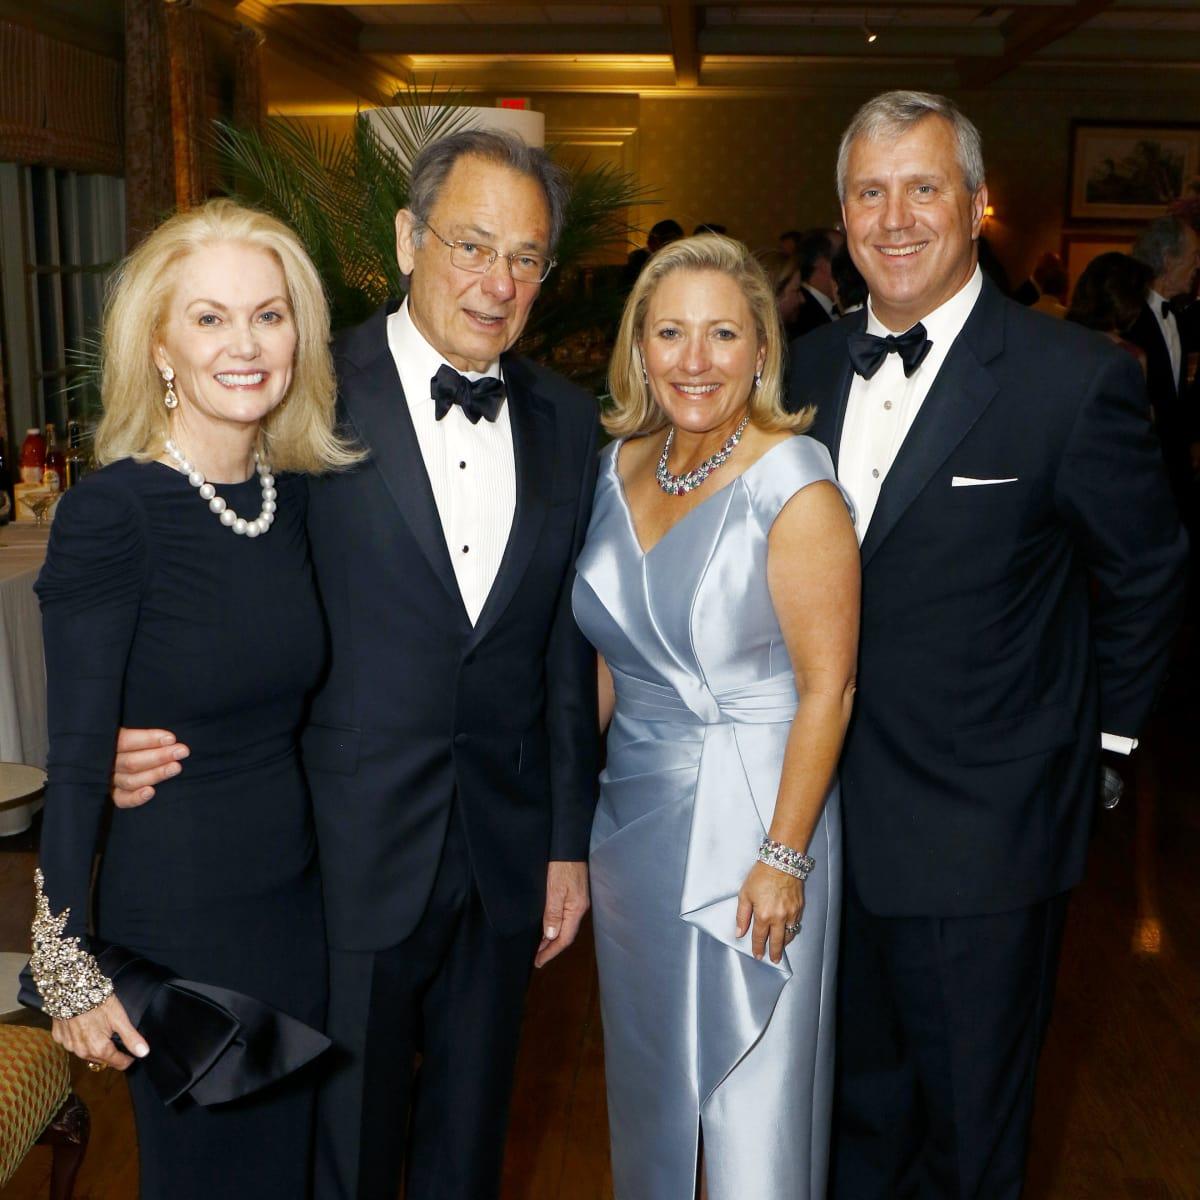 Nancy Cain Marcus & Tom Roush and Carolyn and Karl Rathjen